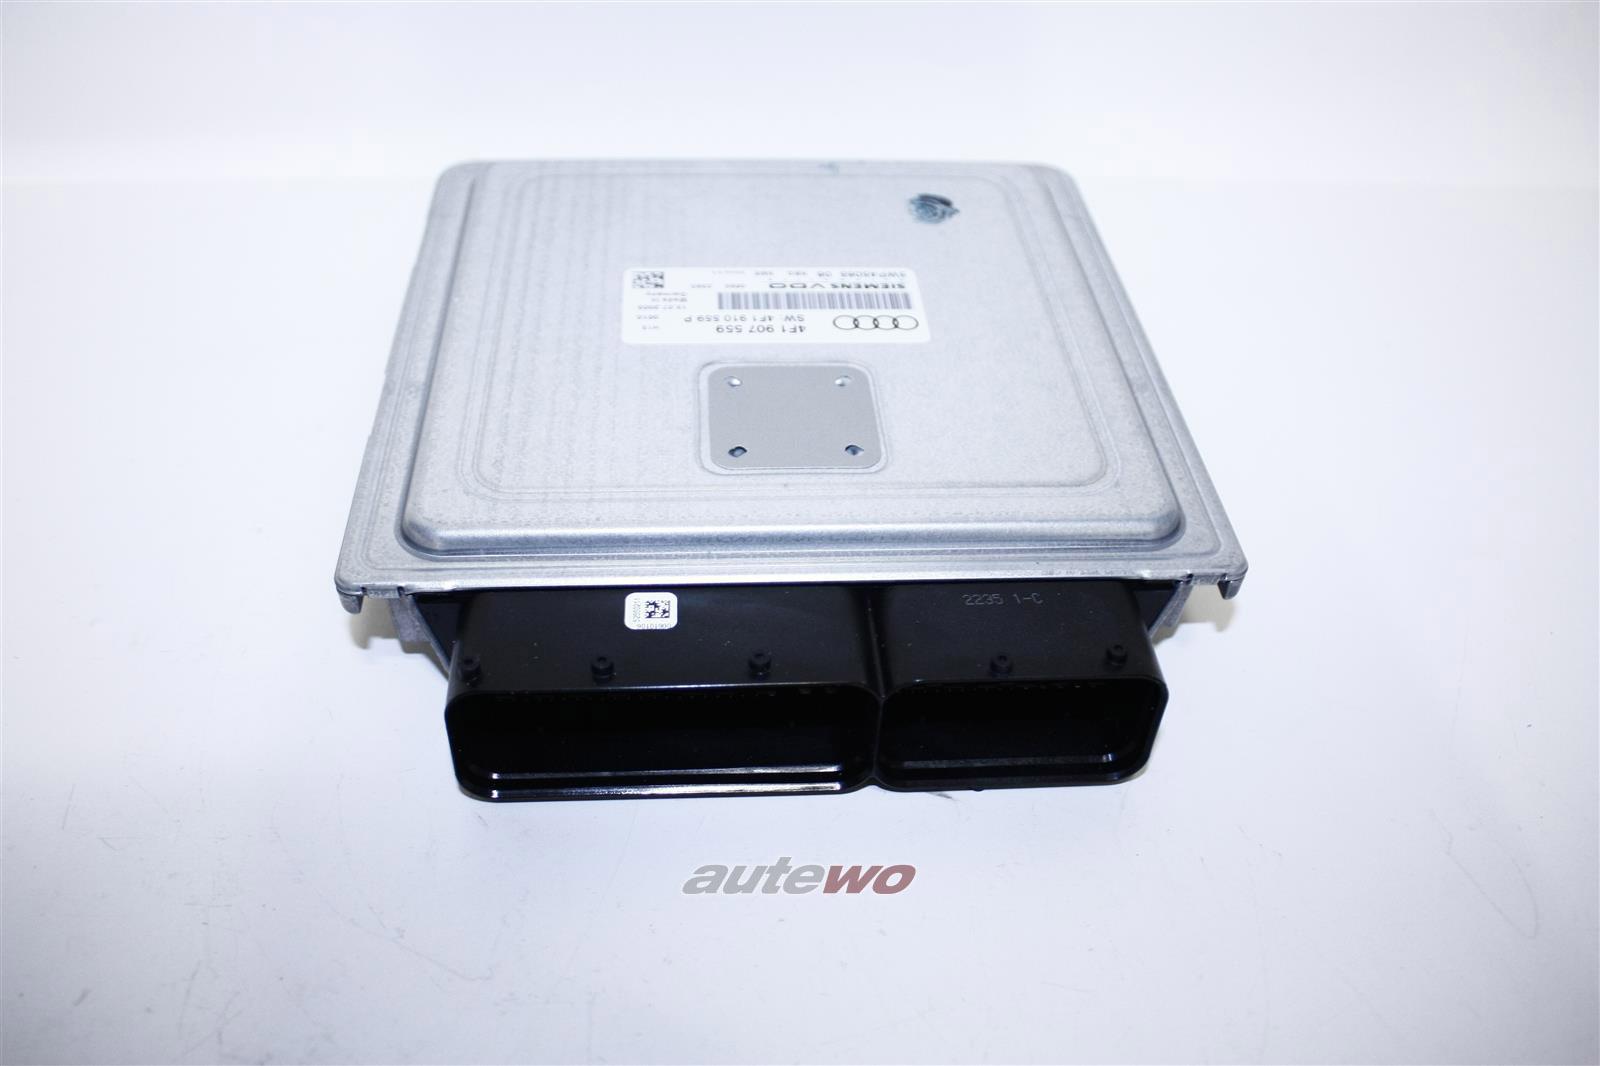 4F1910559PX/SX 4F1910559P NEU Audi A6 4F 3.2l FSI 6 Zyl. AUK Motorsteuergerät